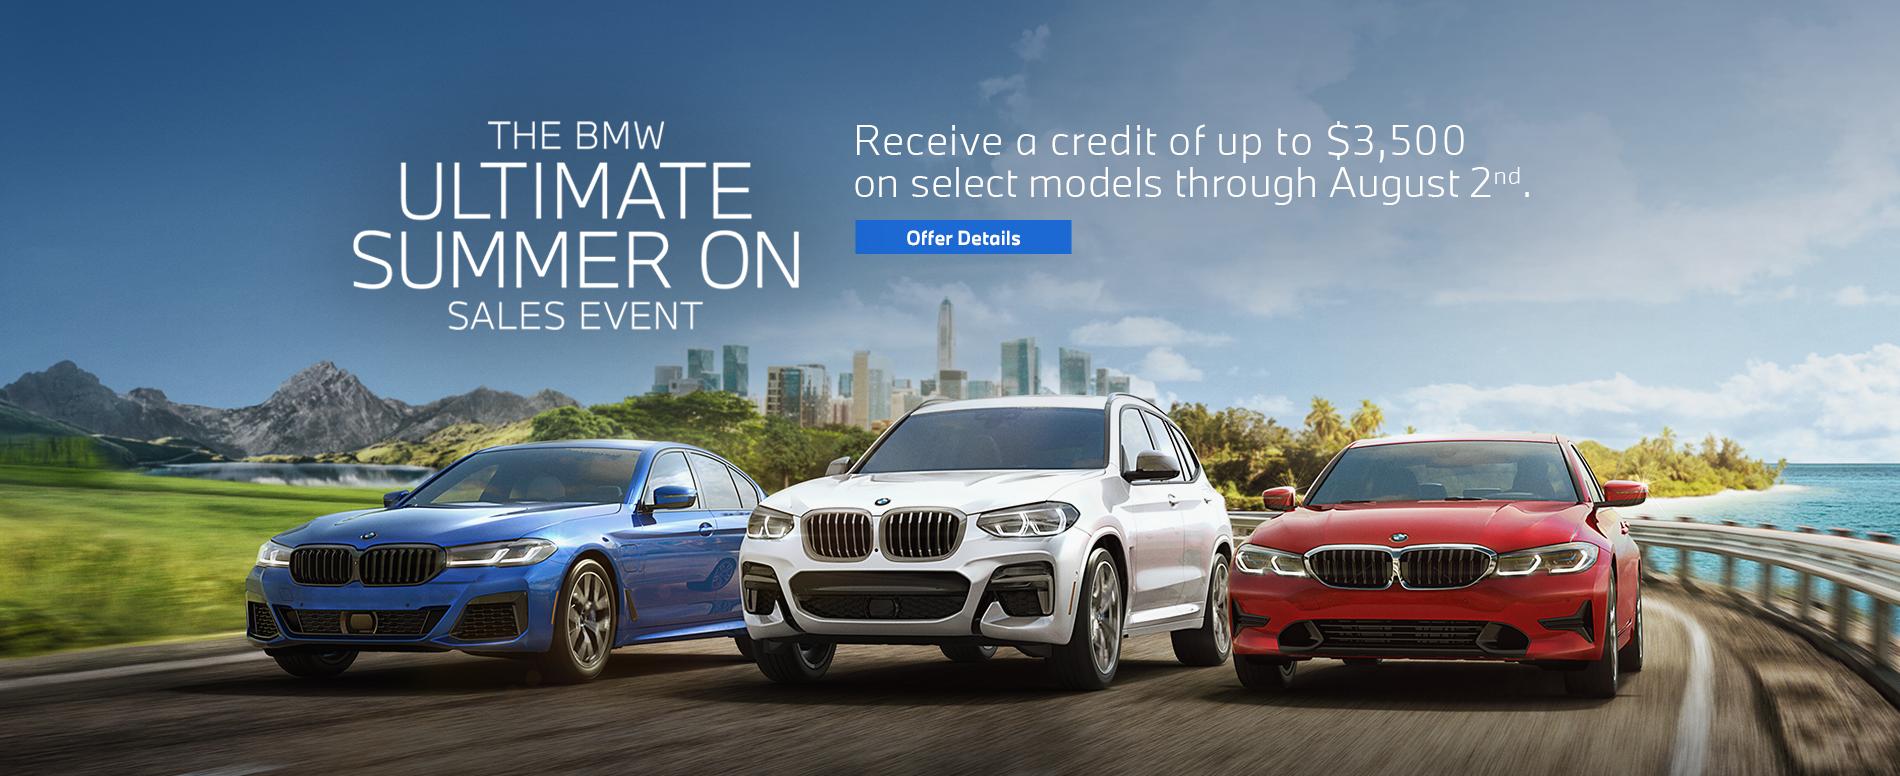 BMW Summer On Sales Event